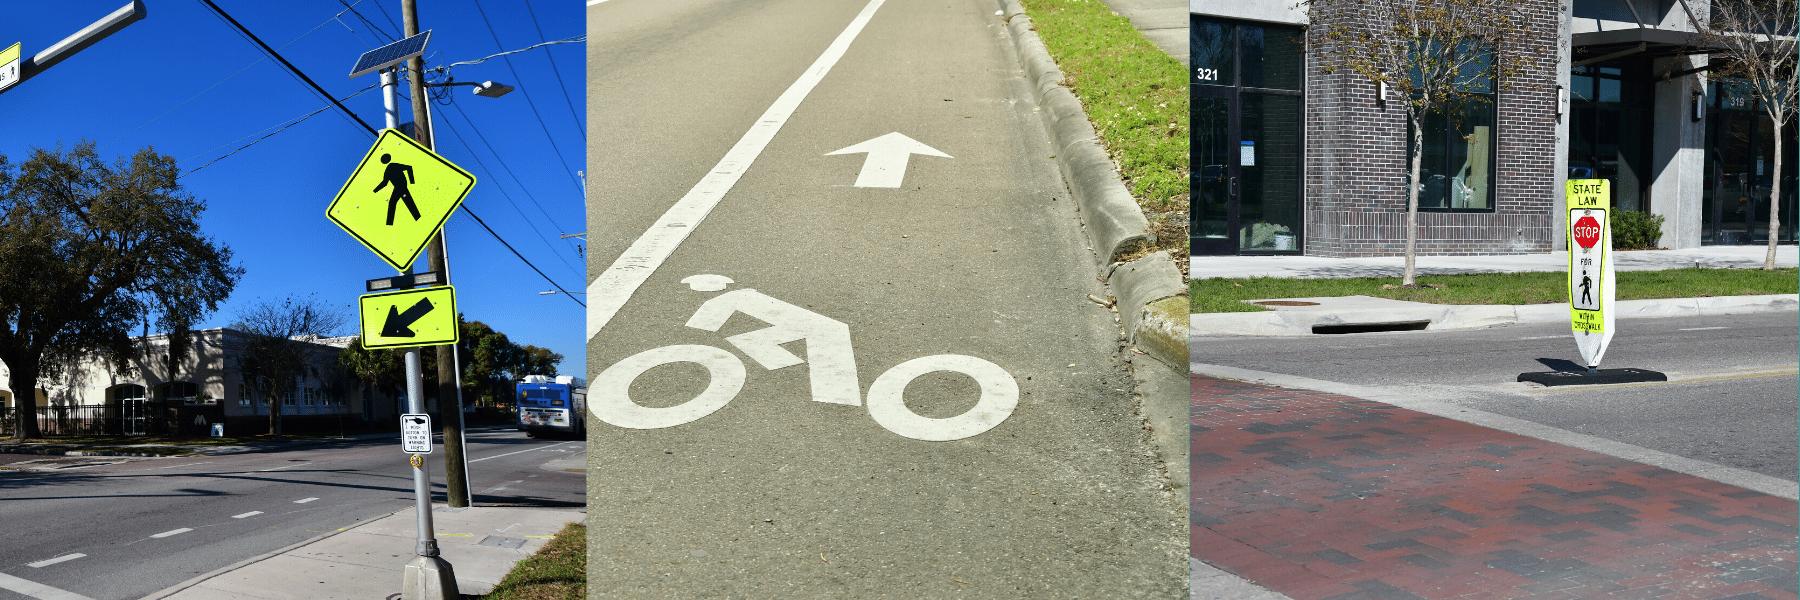 Potential Transportation Improvements along Central Aveune